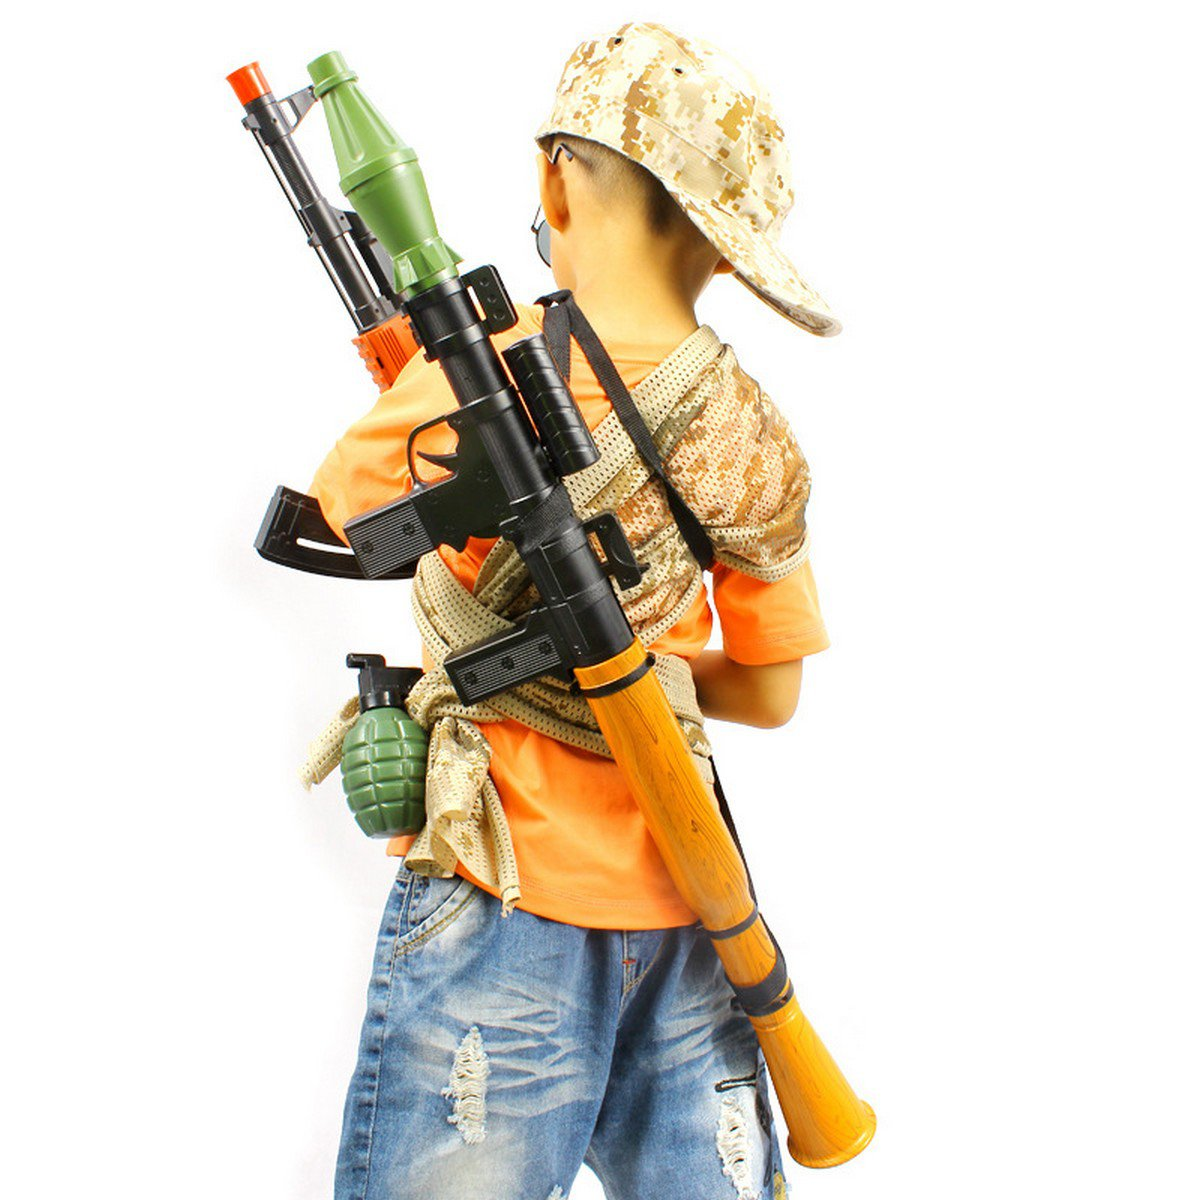 Buy Rocket Gun Rocket Launcher Toy Submachine Gun Soft Bullet Pistol Gun Airgun For Kids Gift Cs Ga